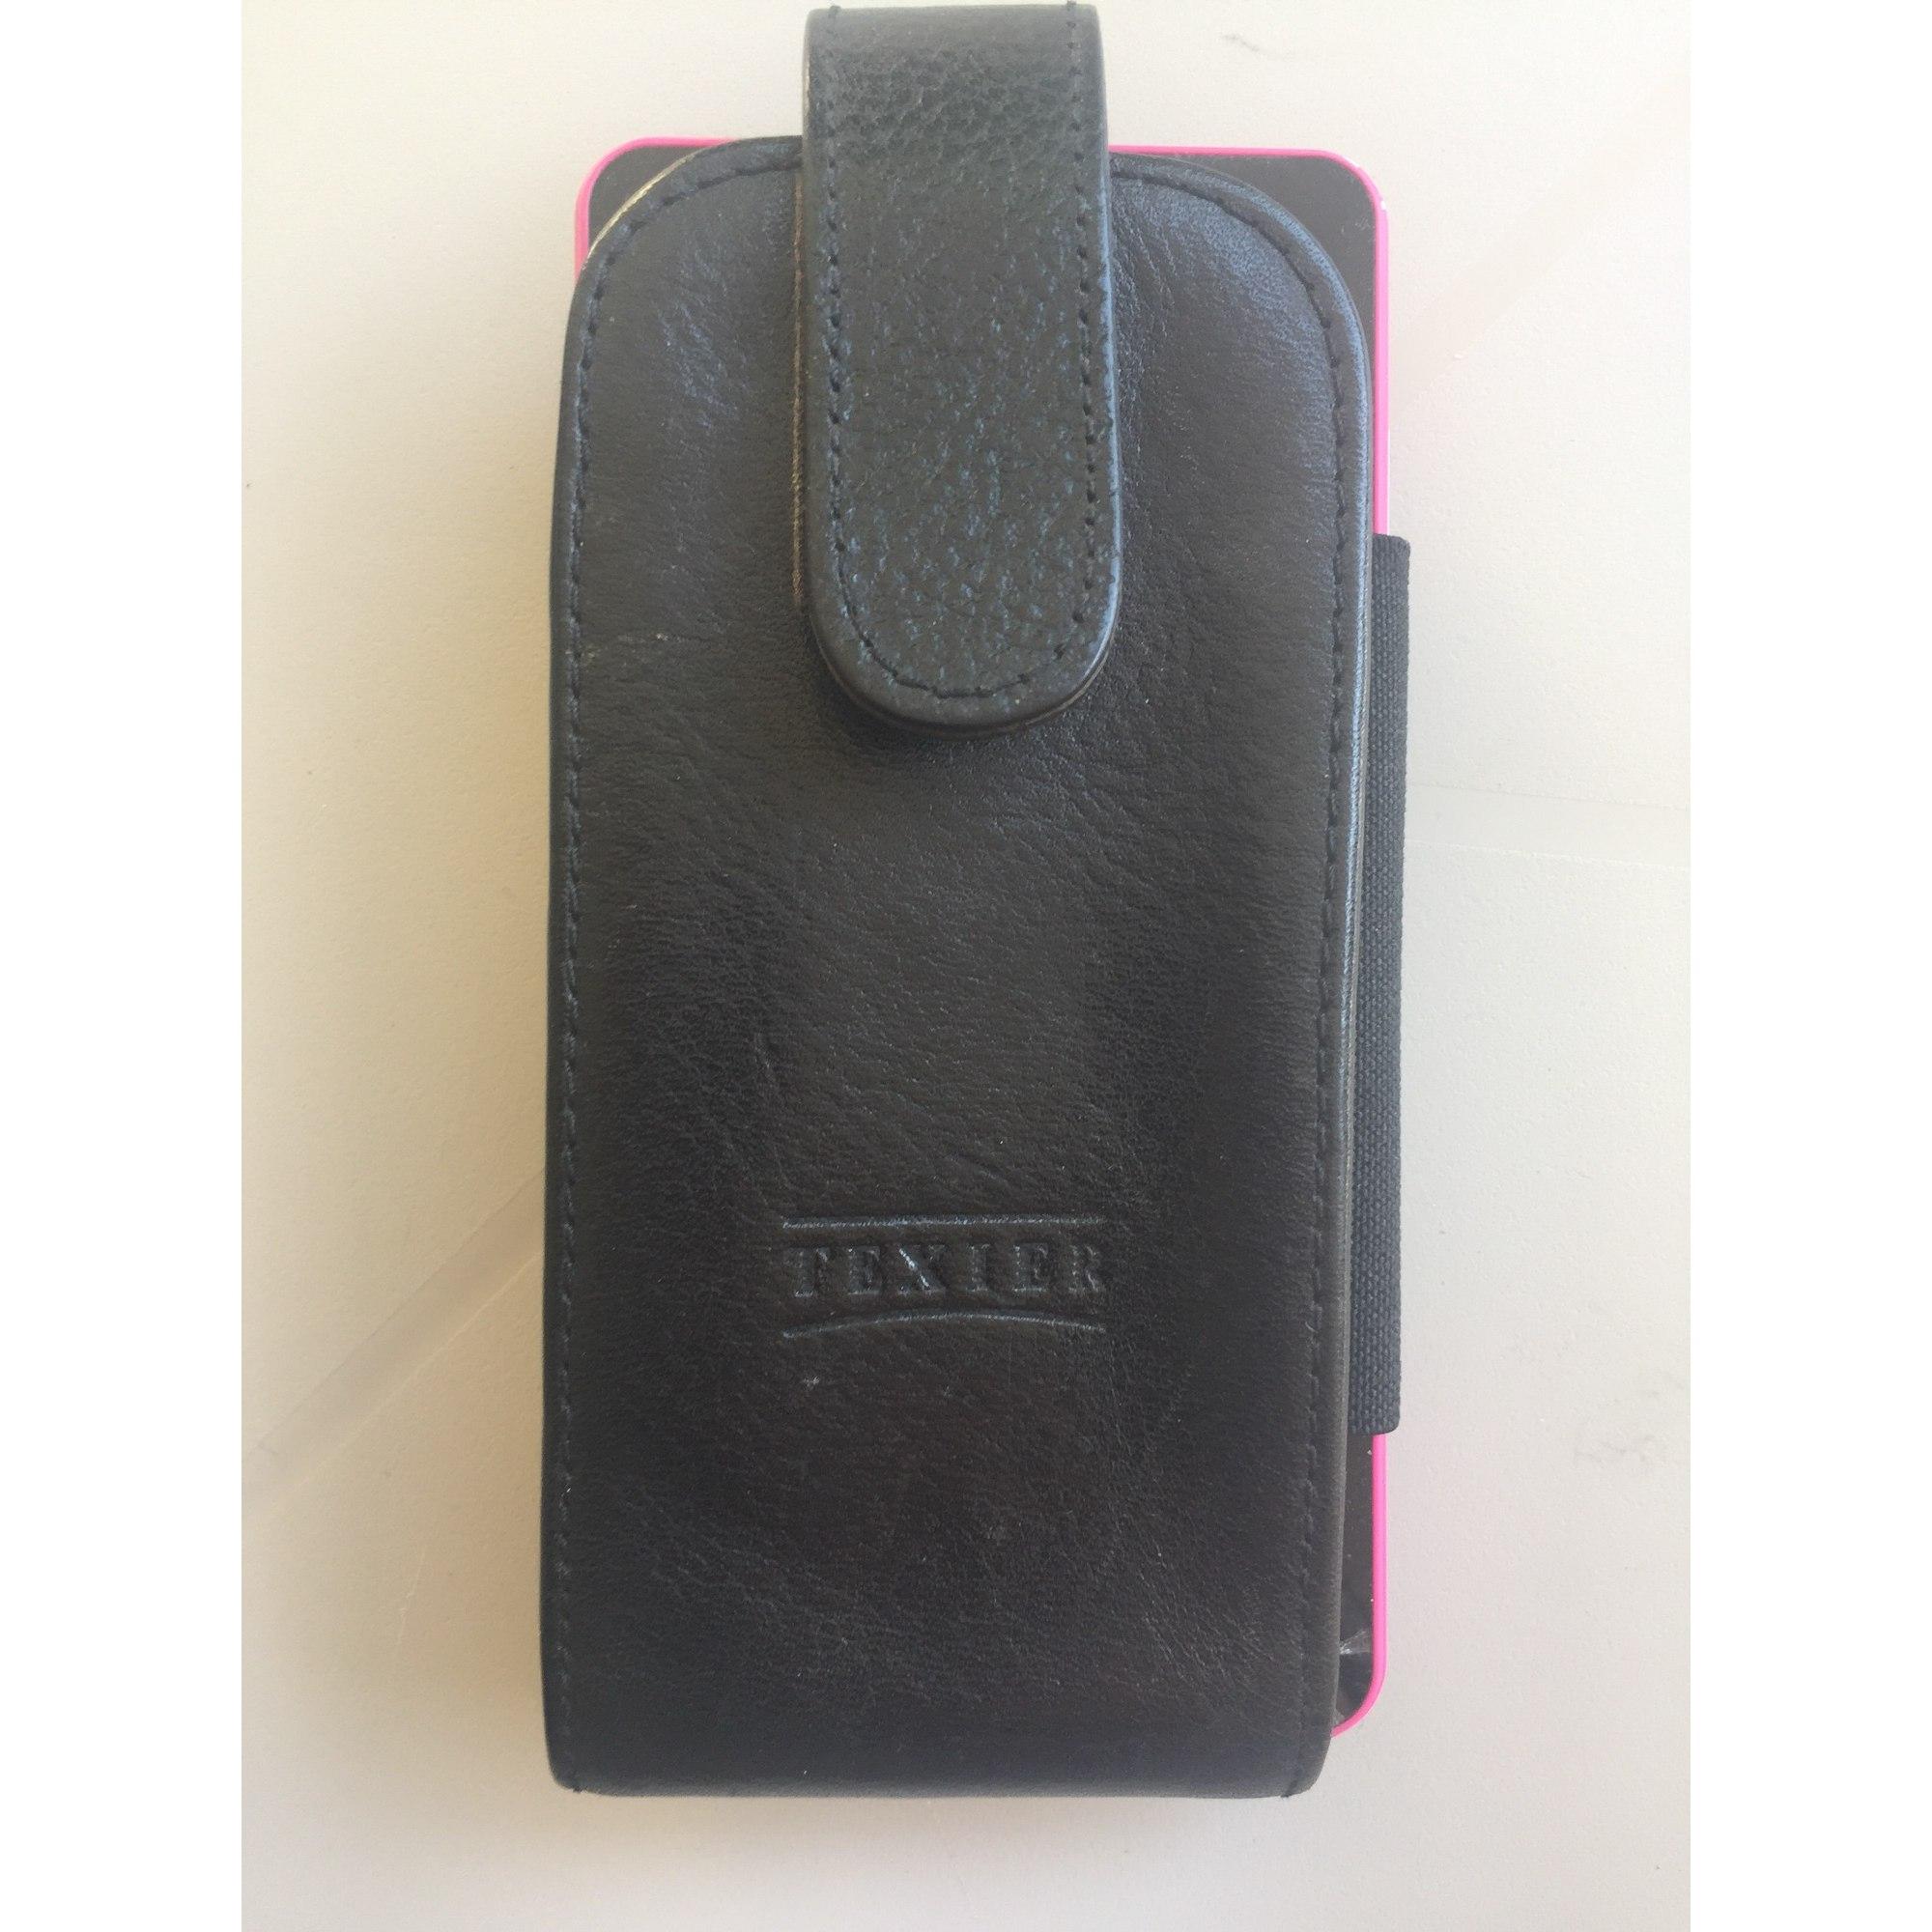 iPhone-Tasche TEXIER Schwarz